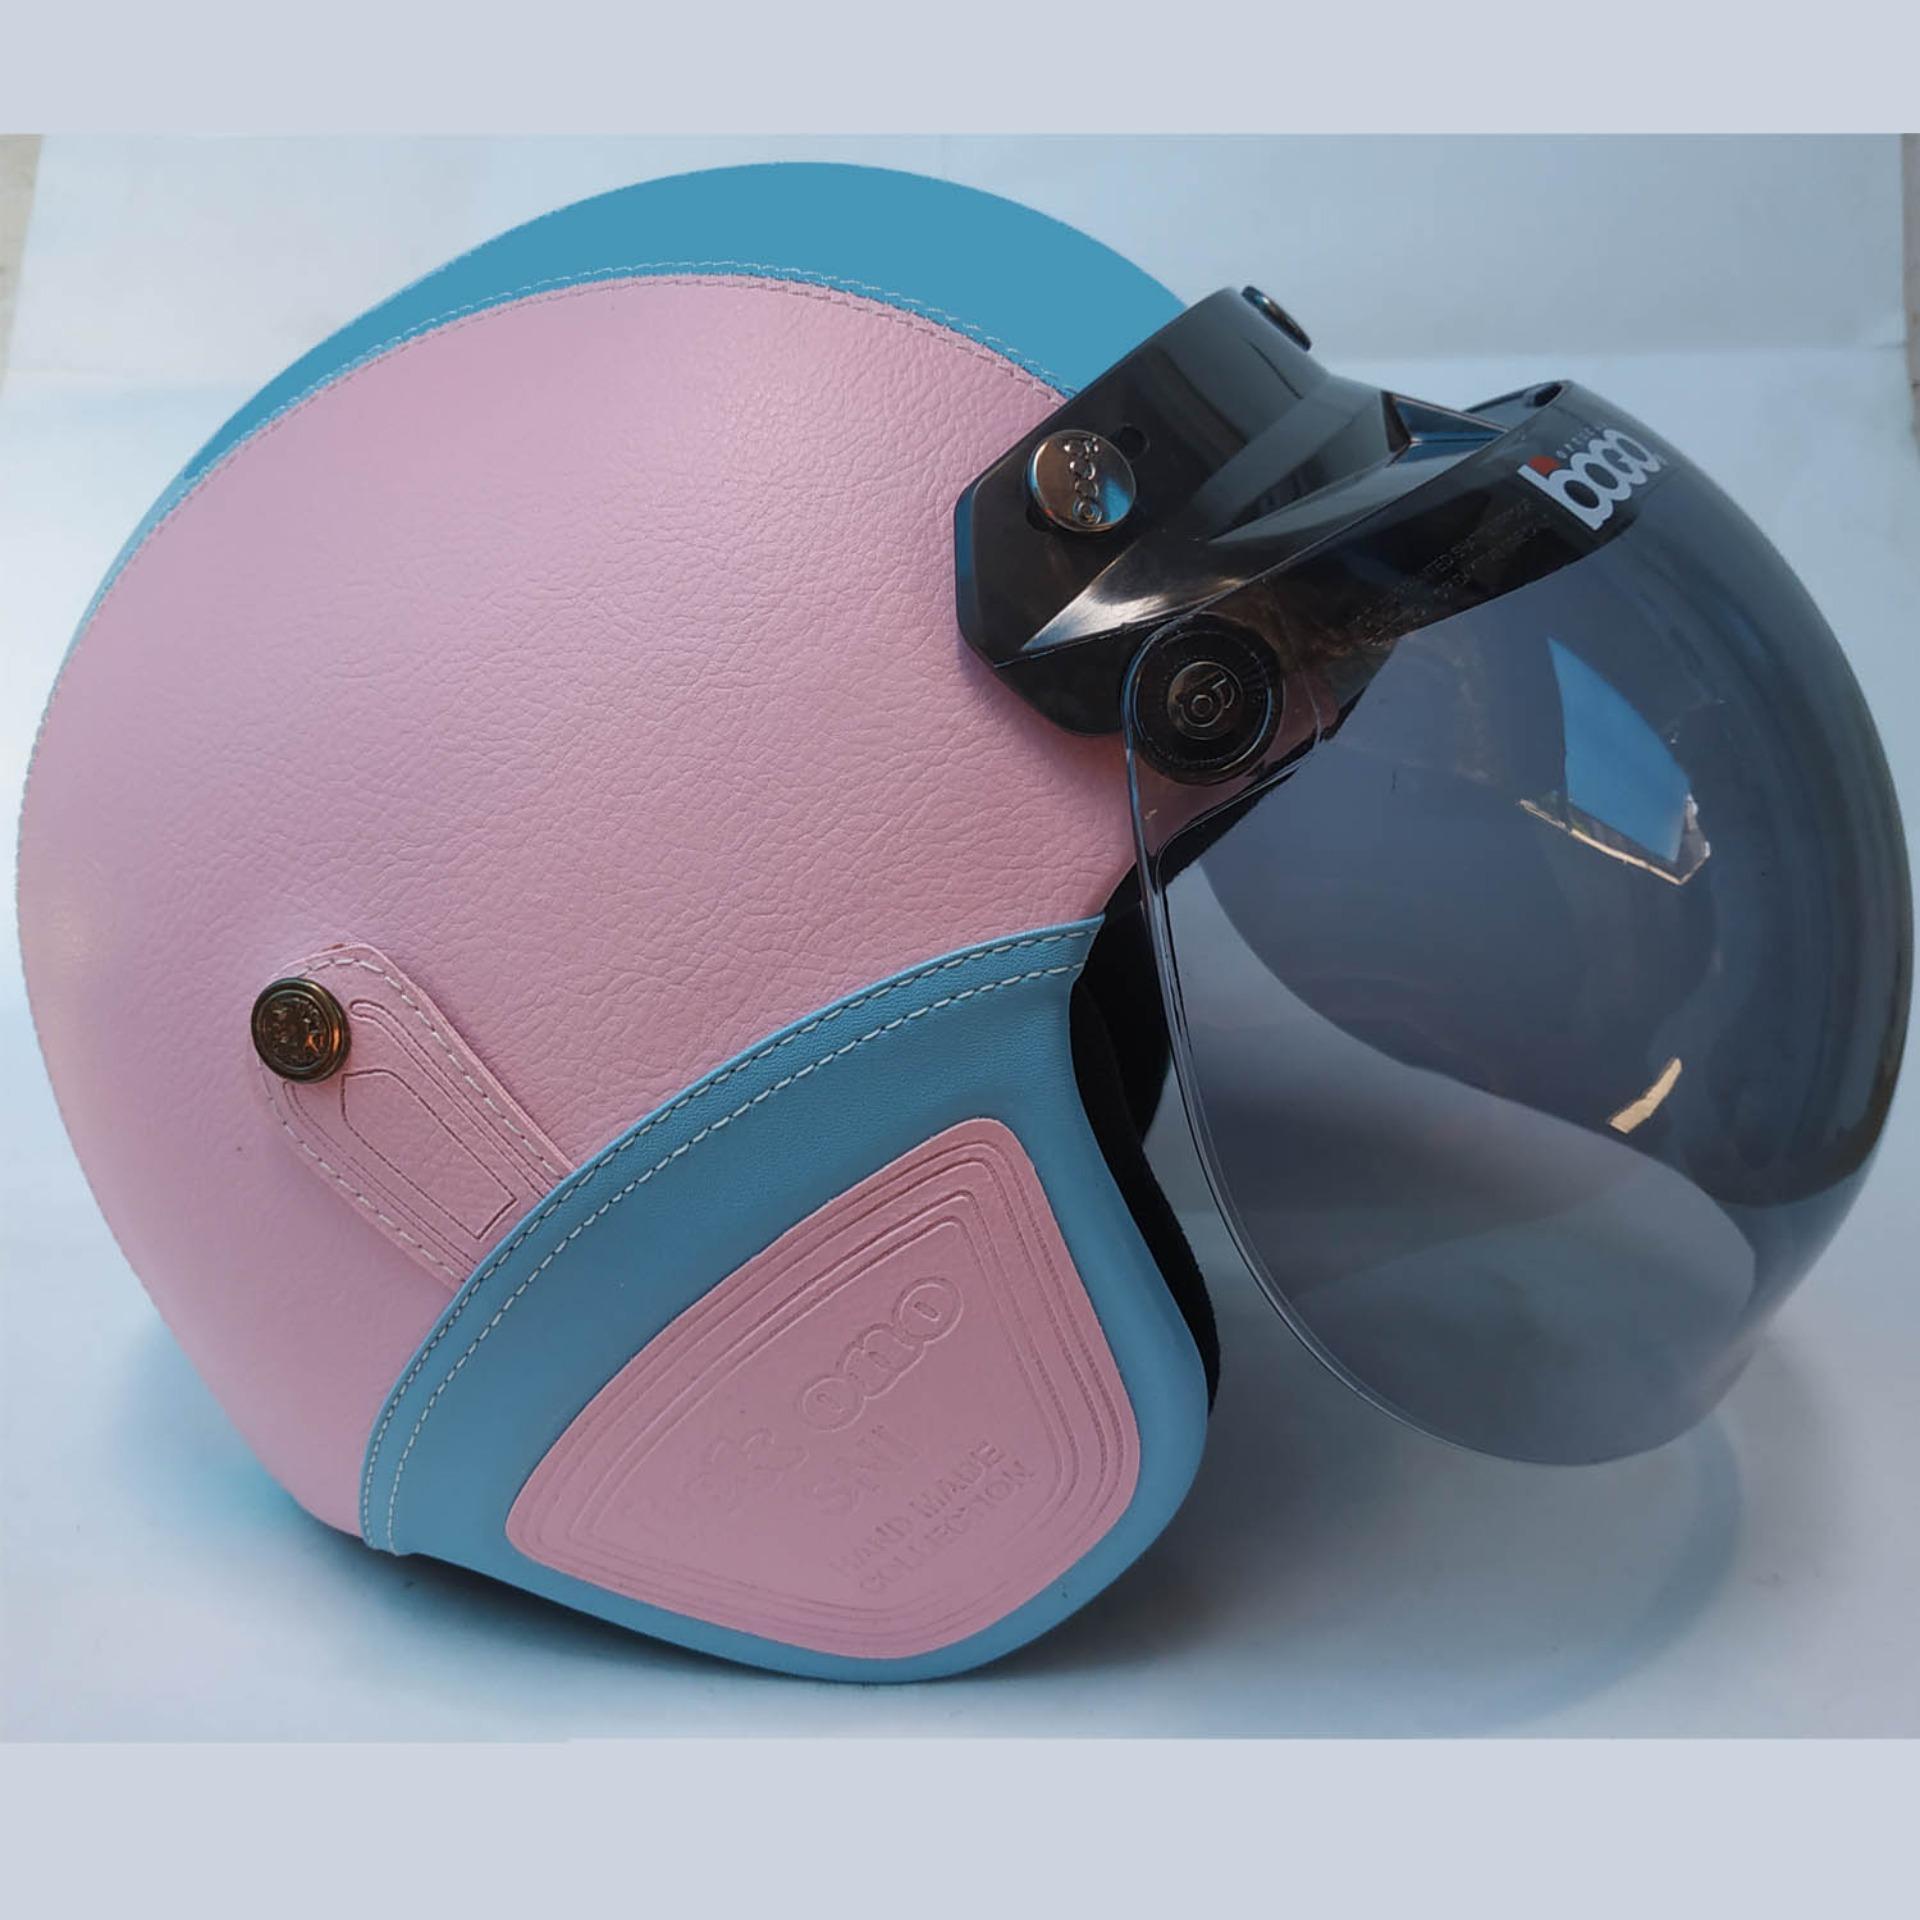 Helm Retro Kacamata Klasik Full Synthetic Leather - Ungu Fanta